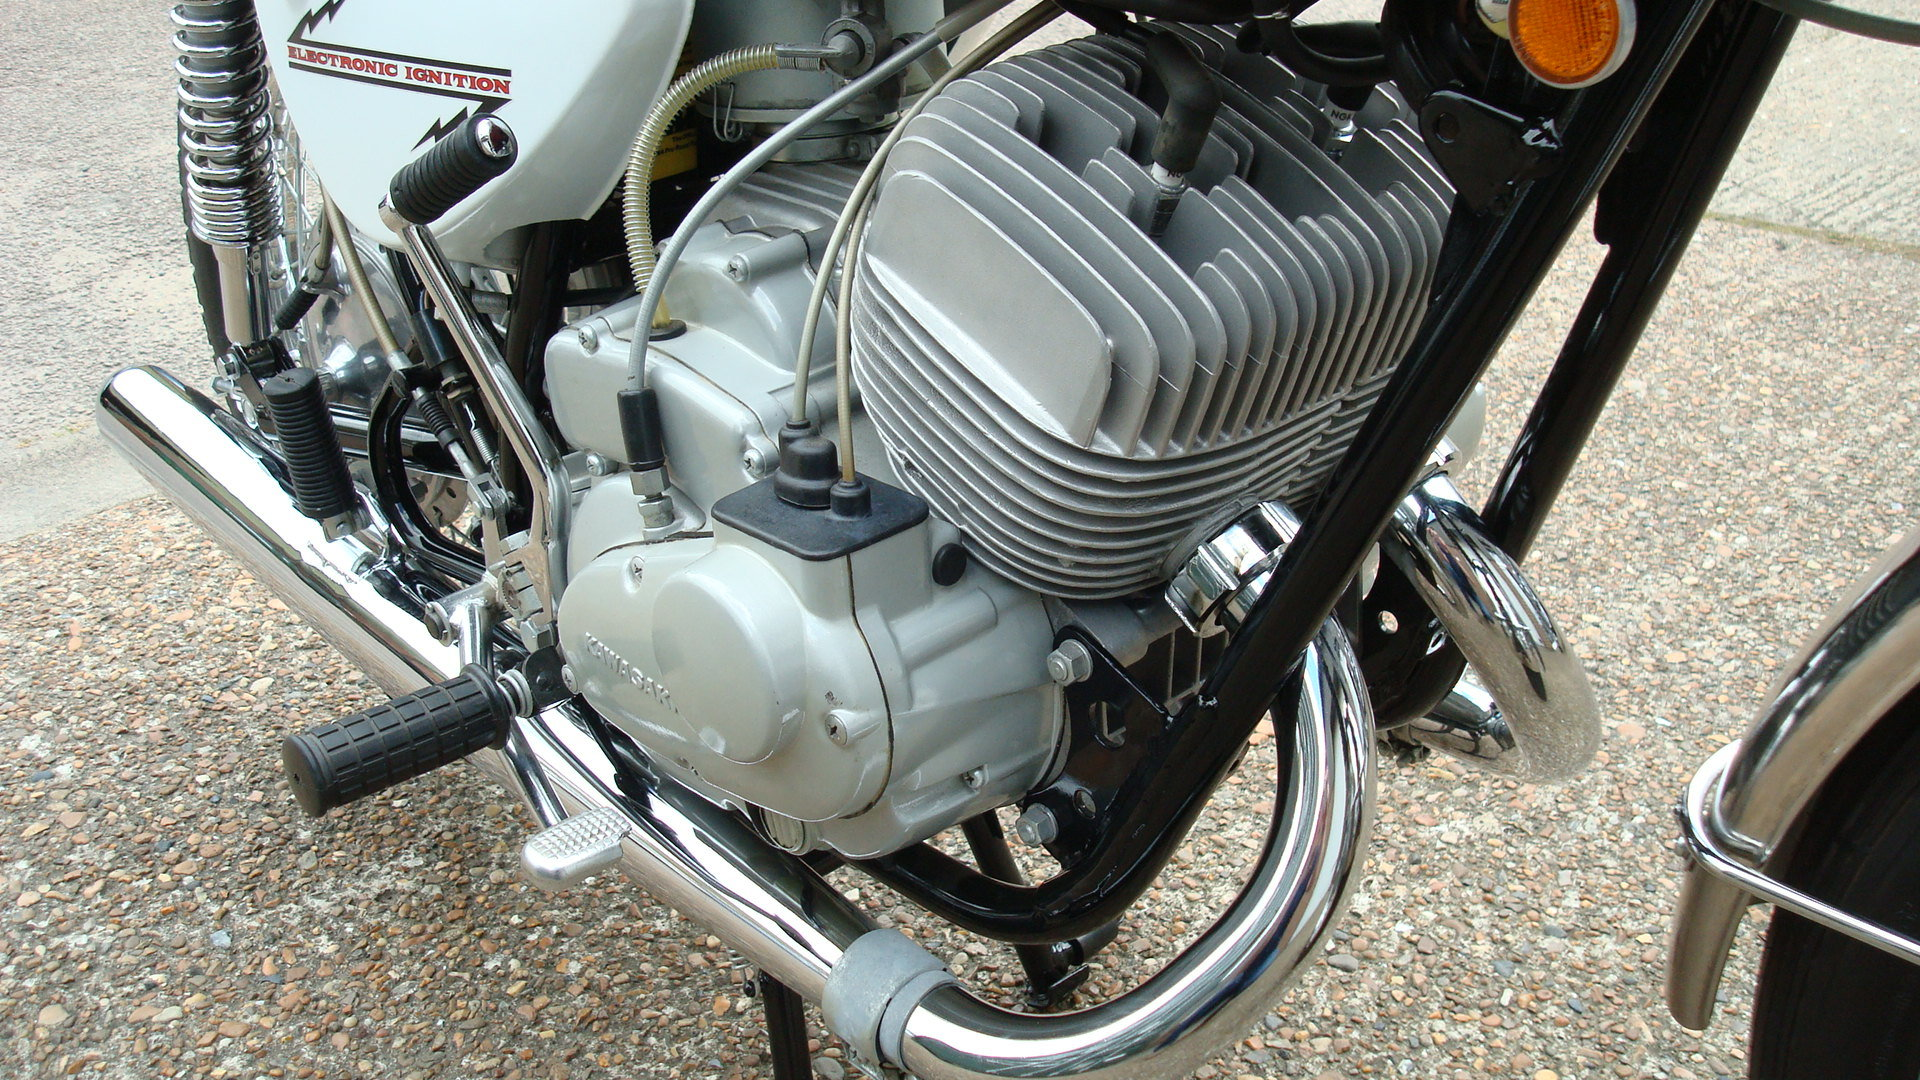 Kawasaki A1A Samurai 250 1970-J **SHOW STANDARD,RESTORED** For Sale (picture 4 of 10)